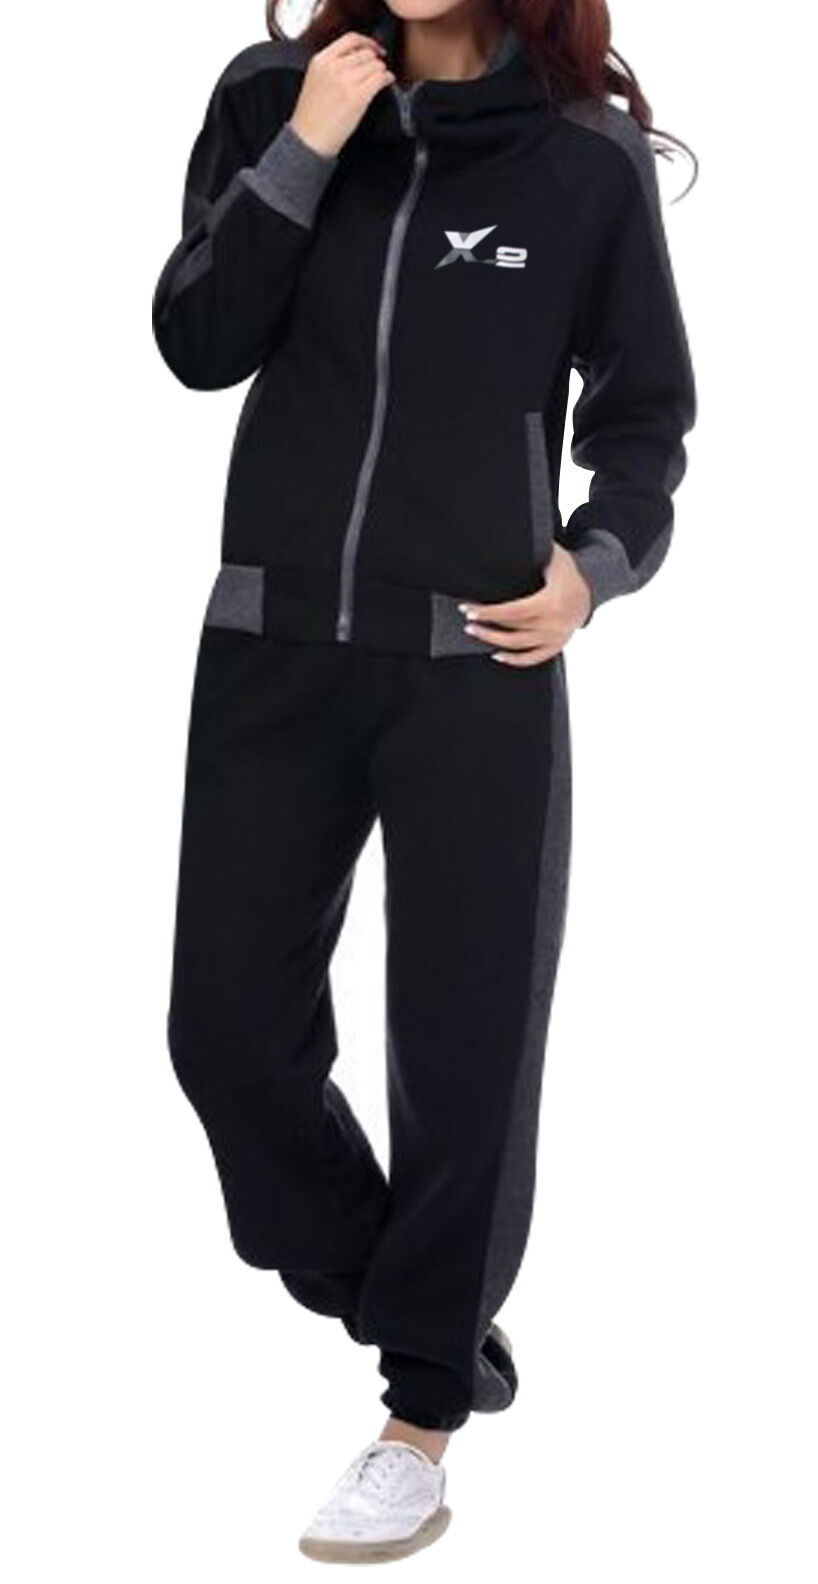 Amazon.com : Nike Womens Black 450684 Tracksuit Size M ...  |Athletic Tracksuits